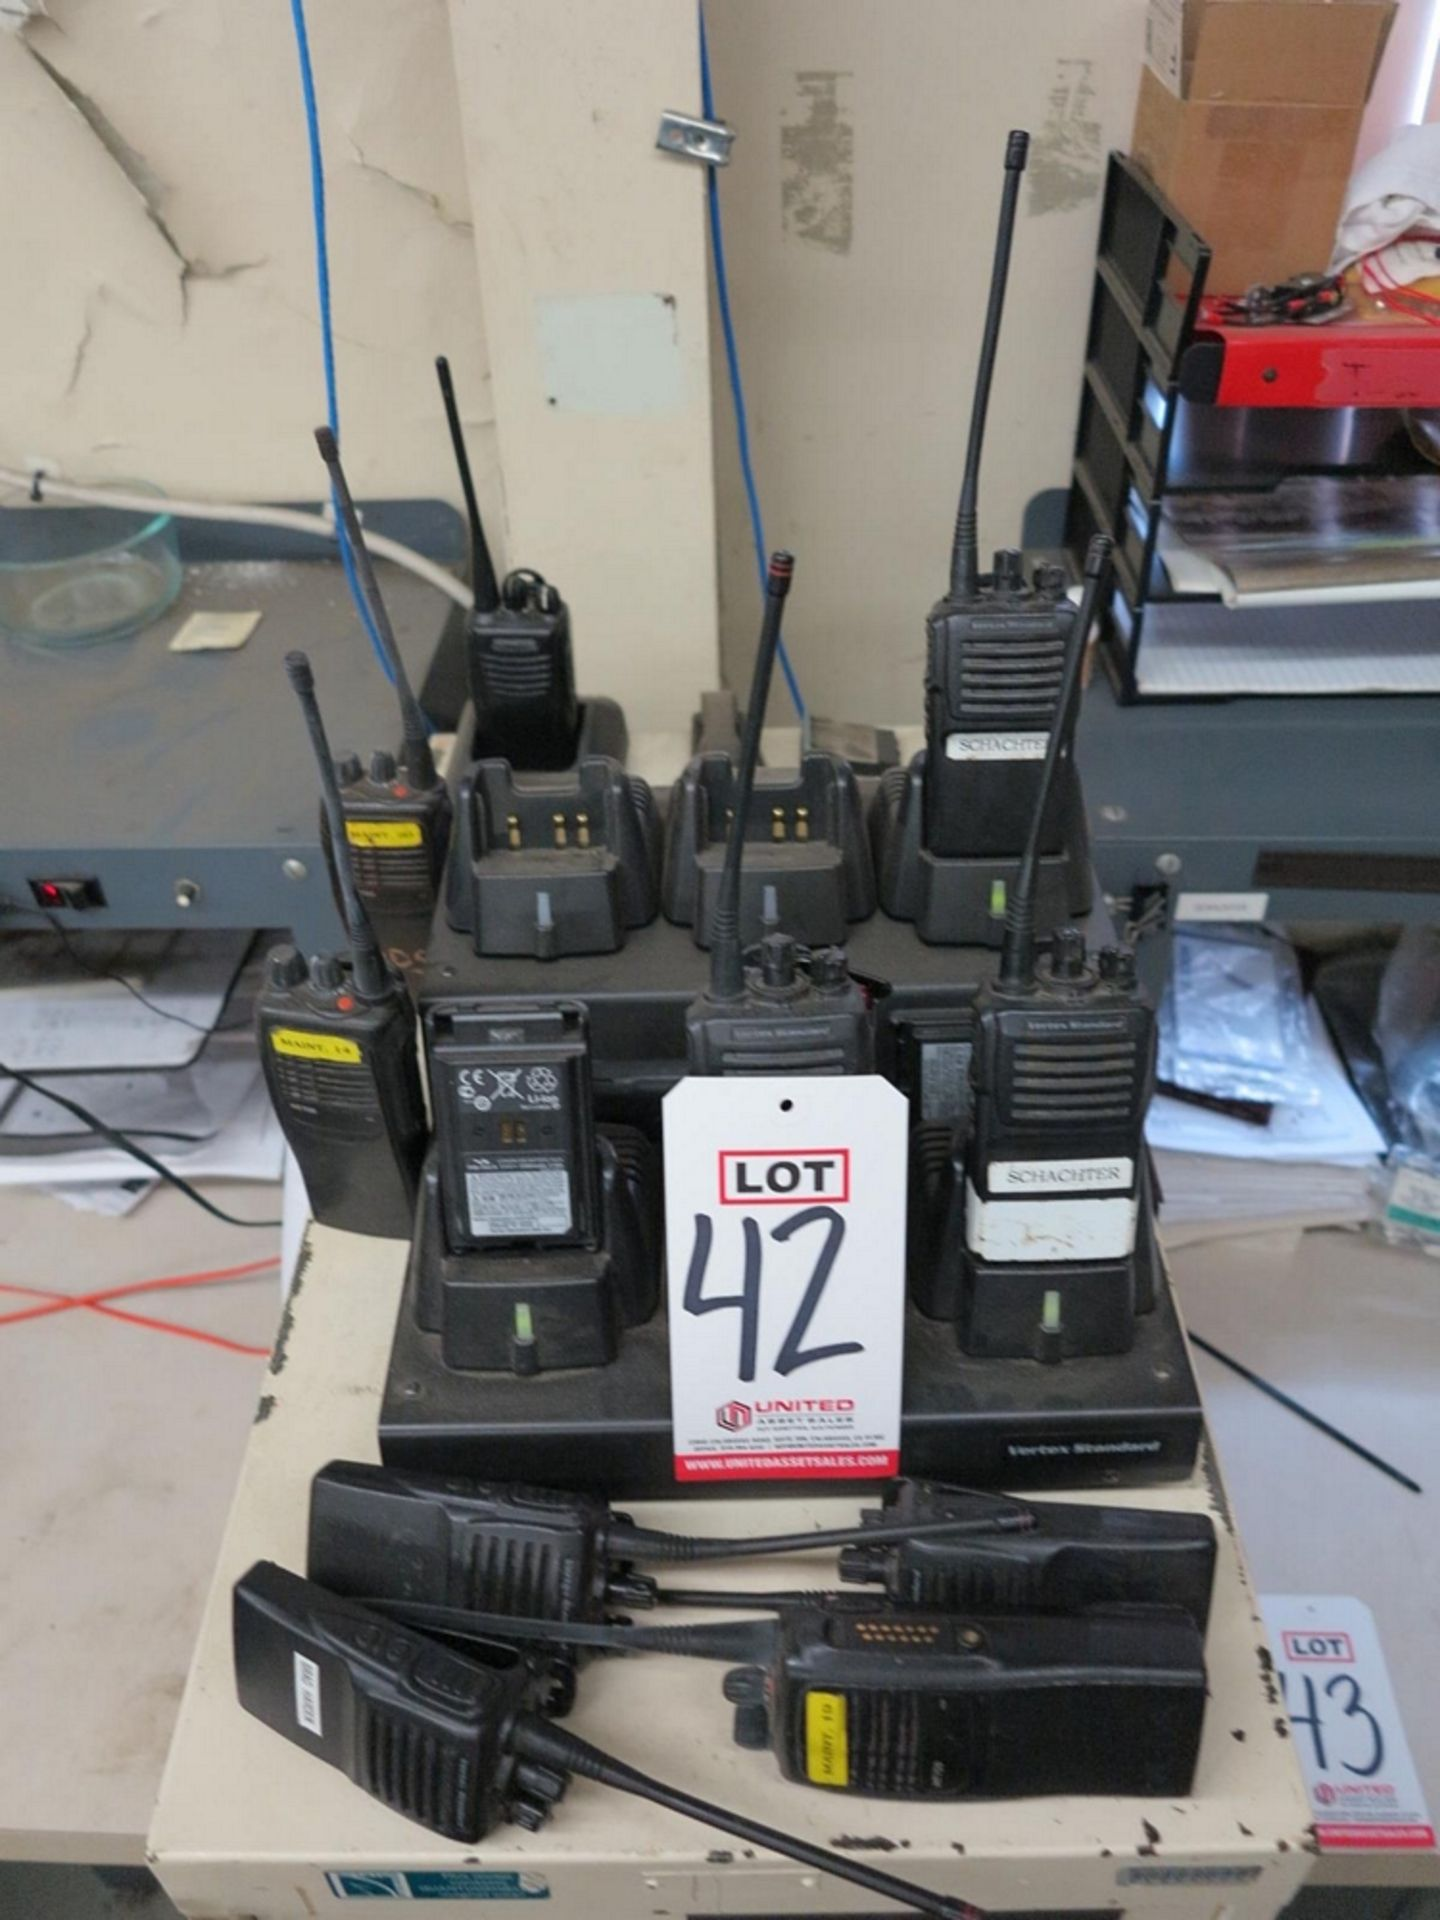 Lot 42 - LOT - 2-WAY COMMUNICATION RADIOS W/ CHARGING STATION